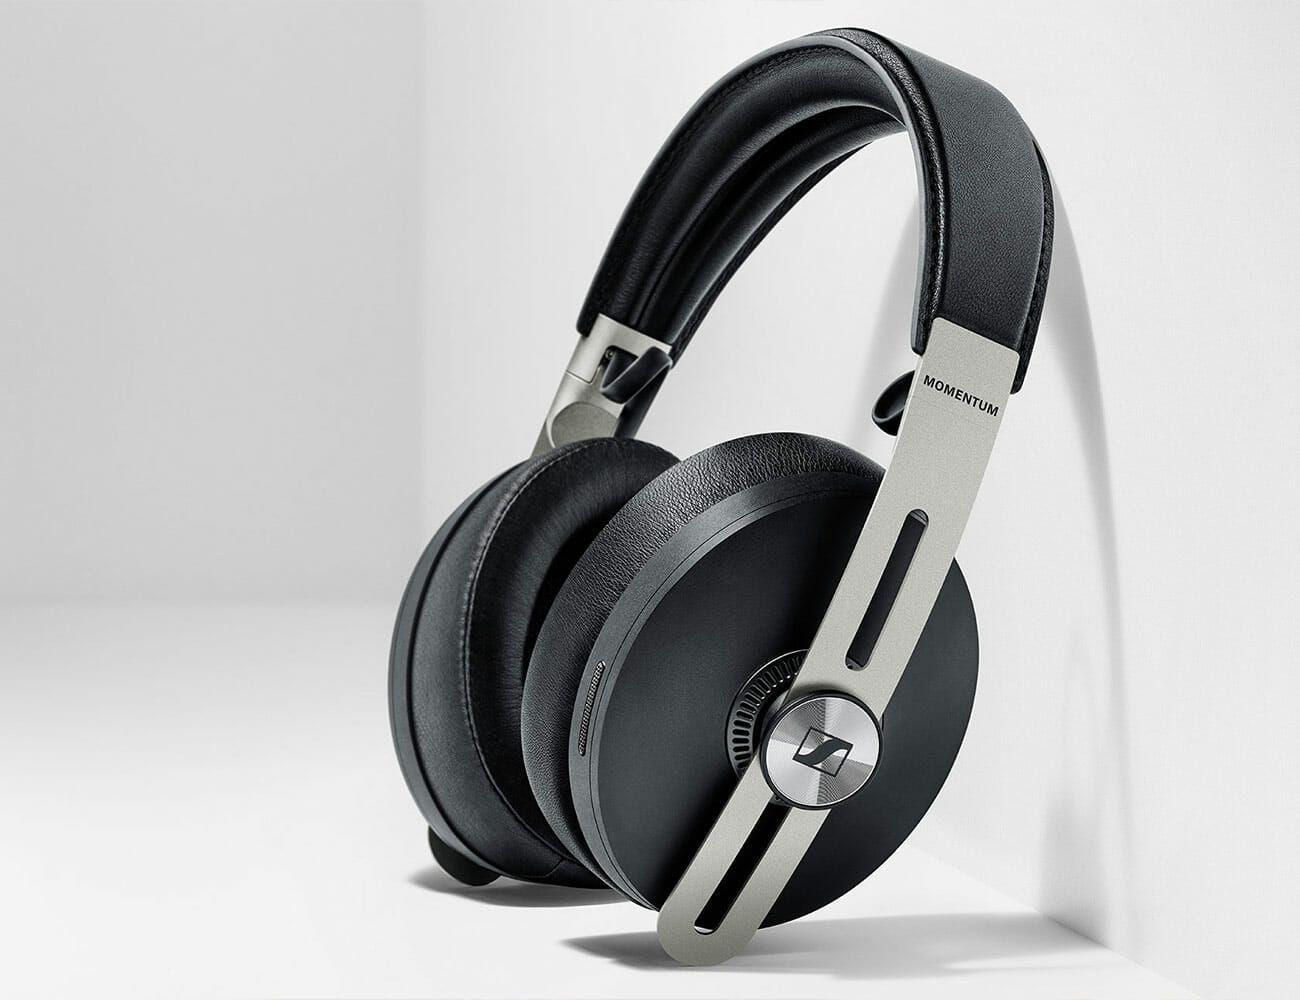 MOMENTUM 3 Headphones